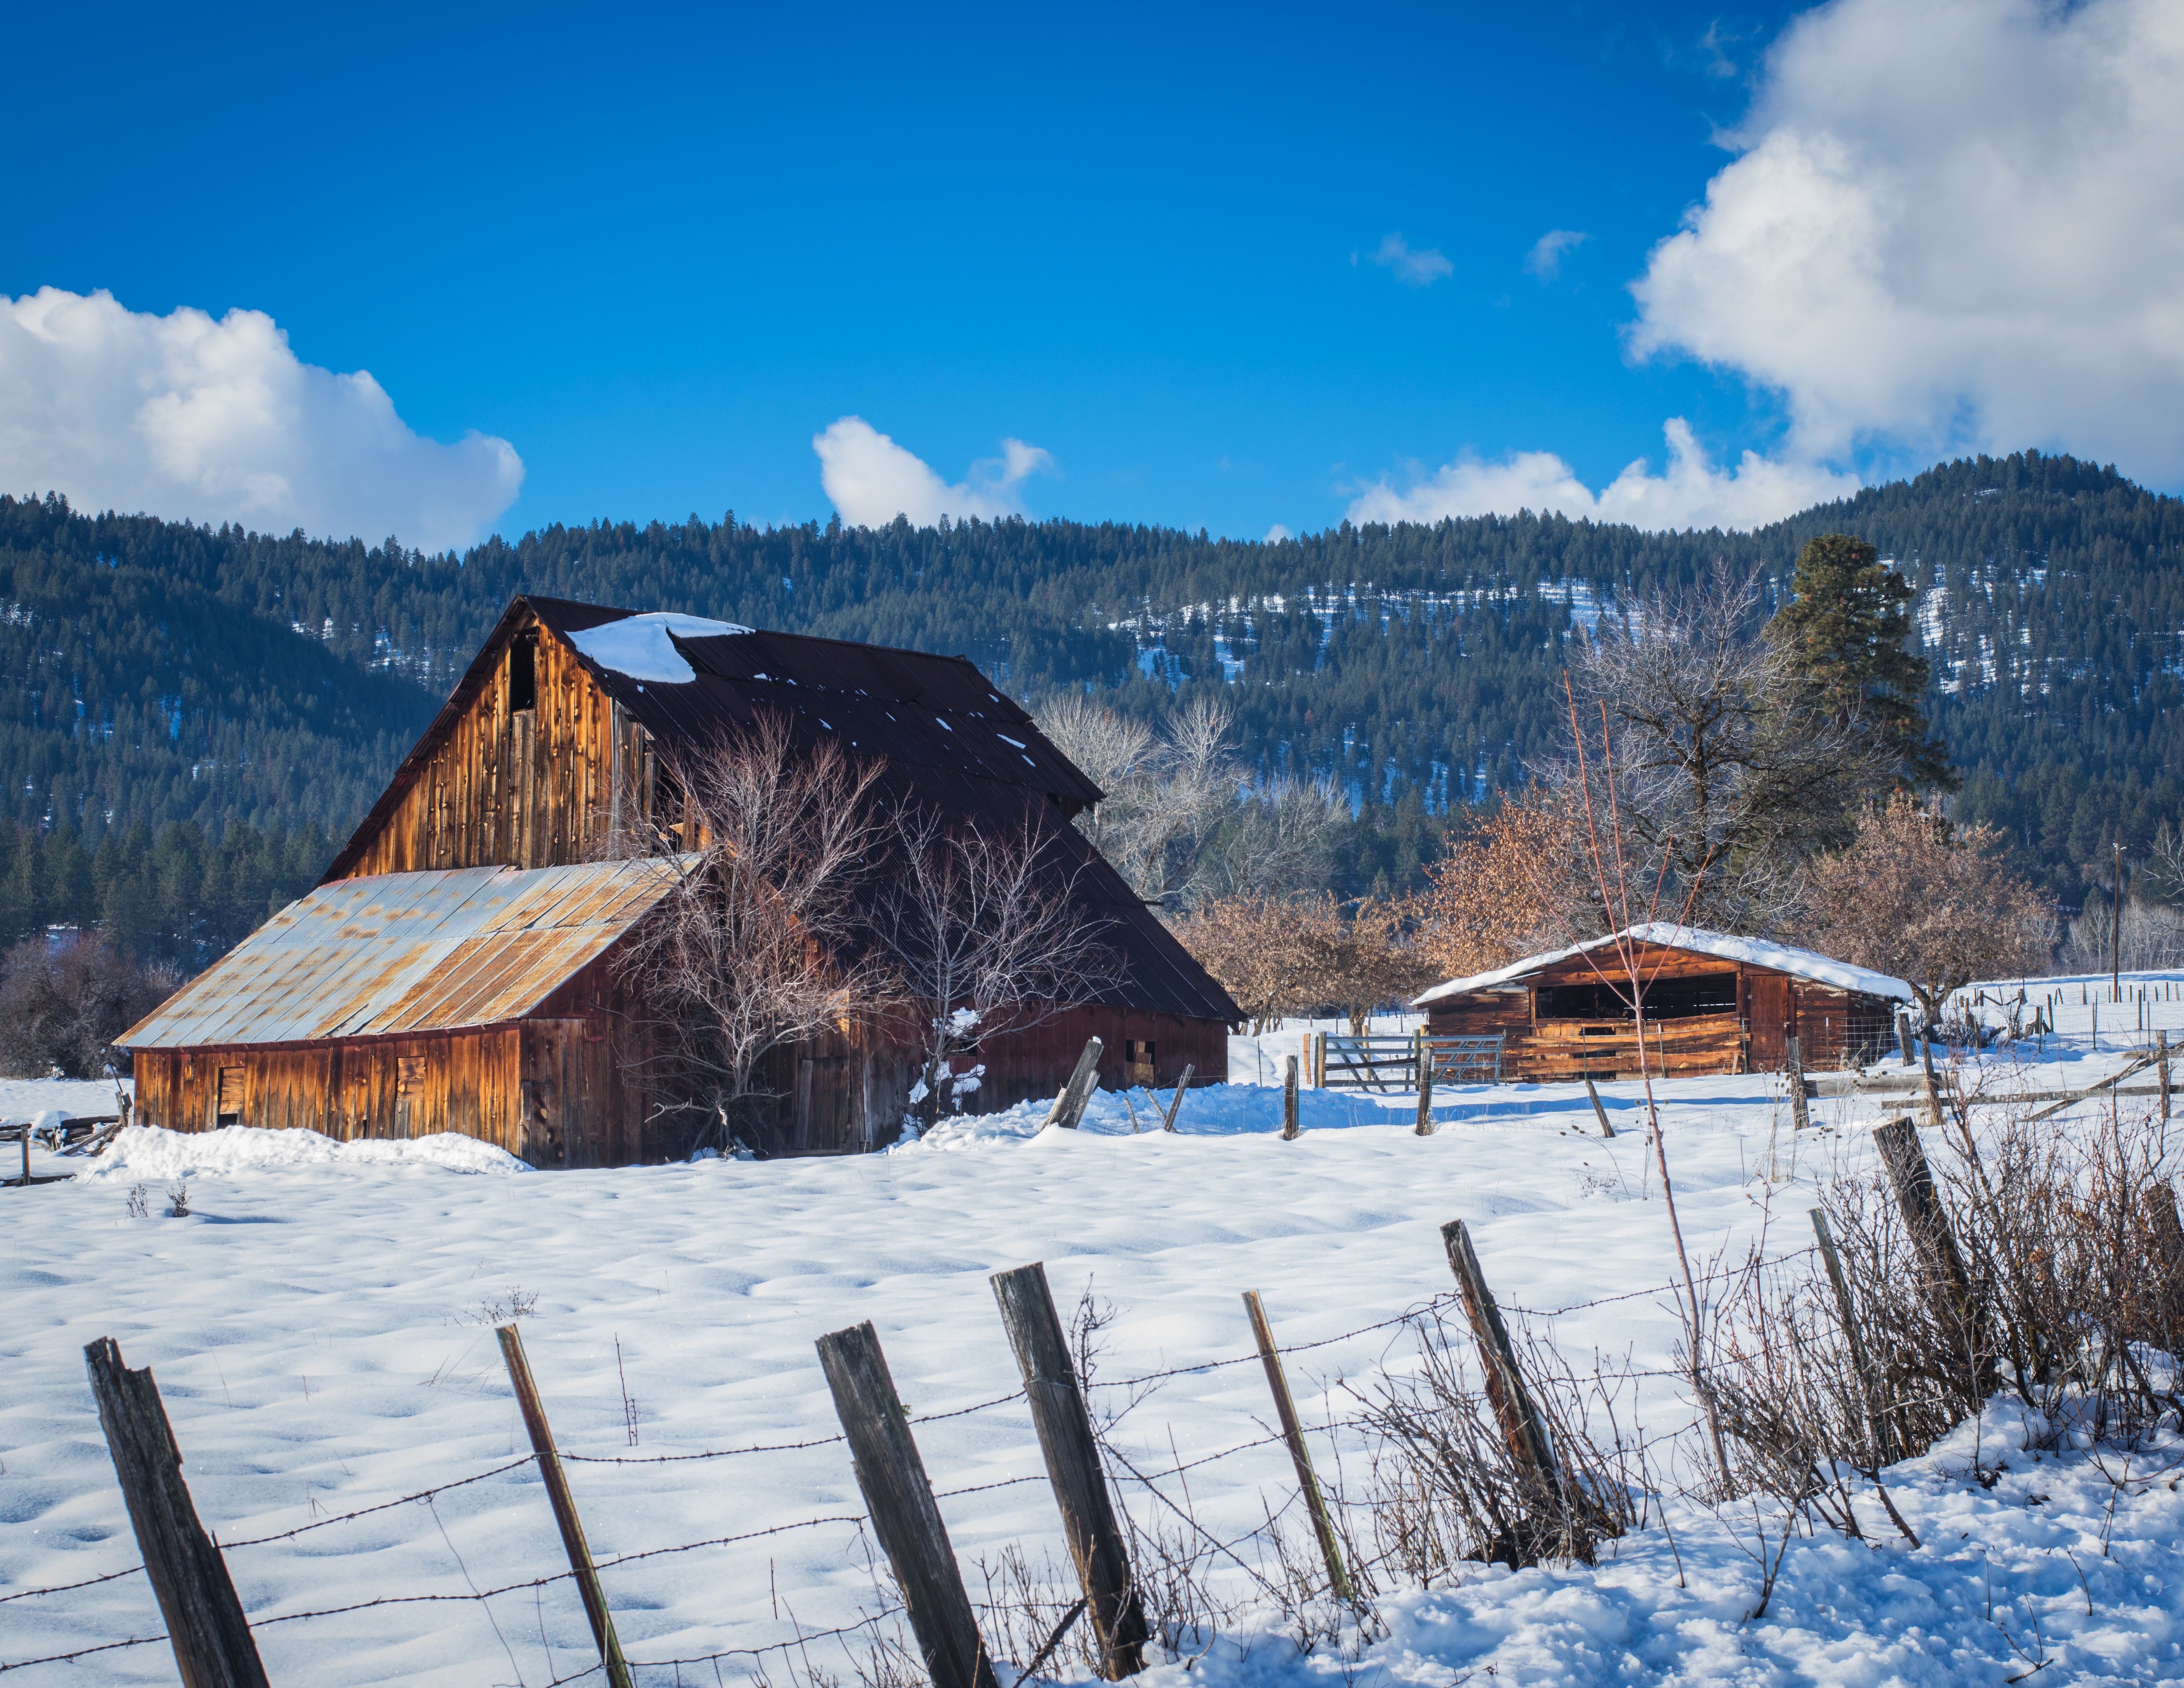 Winter barn photo